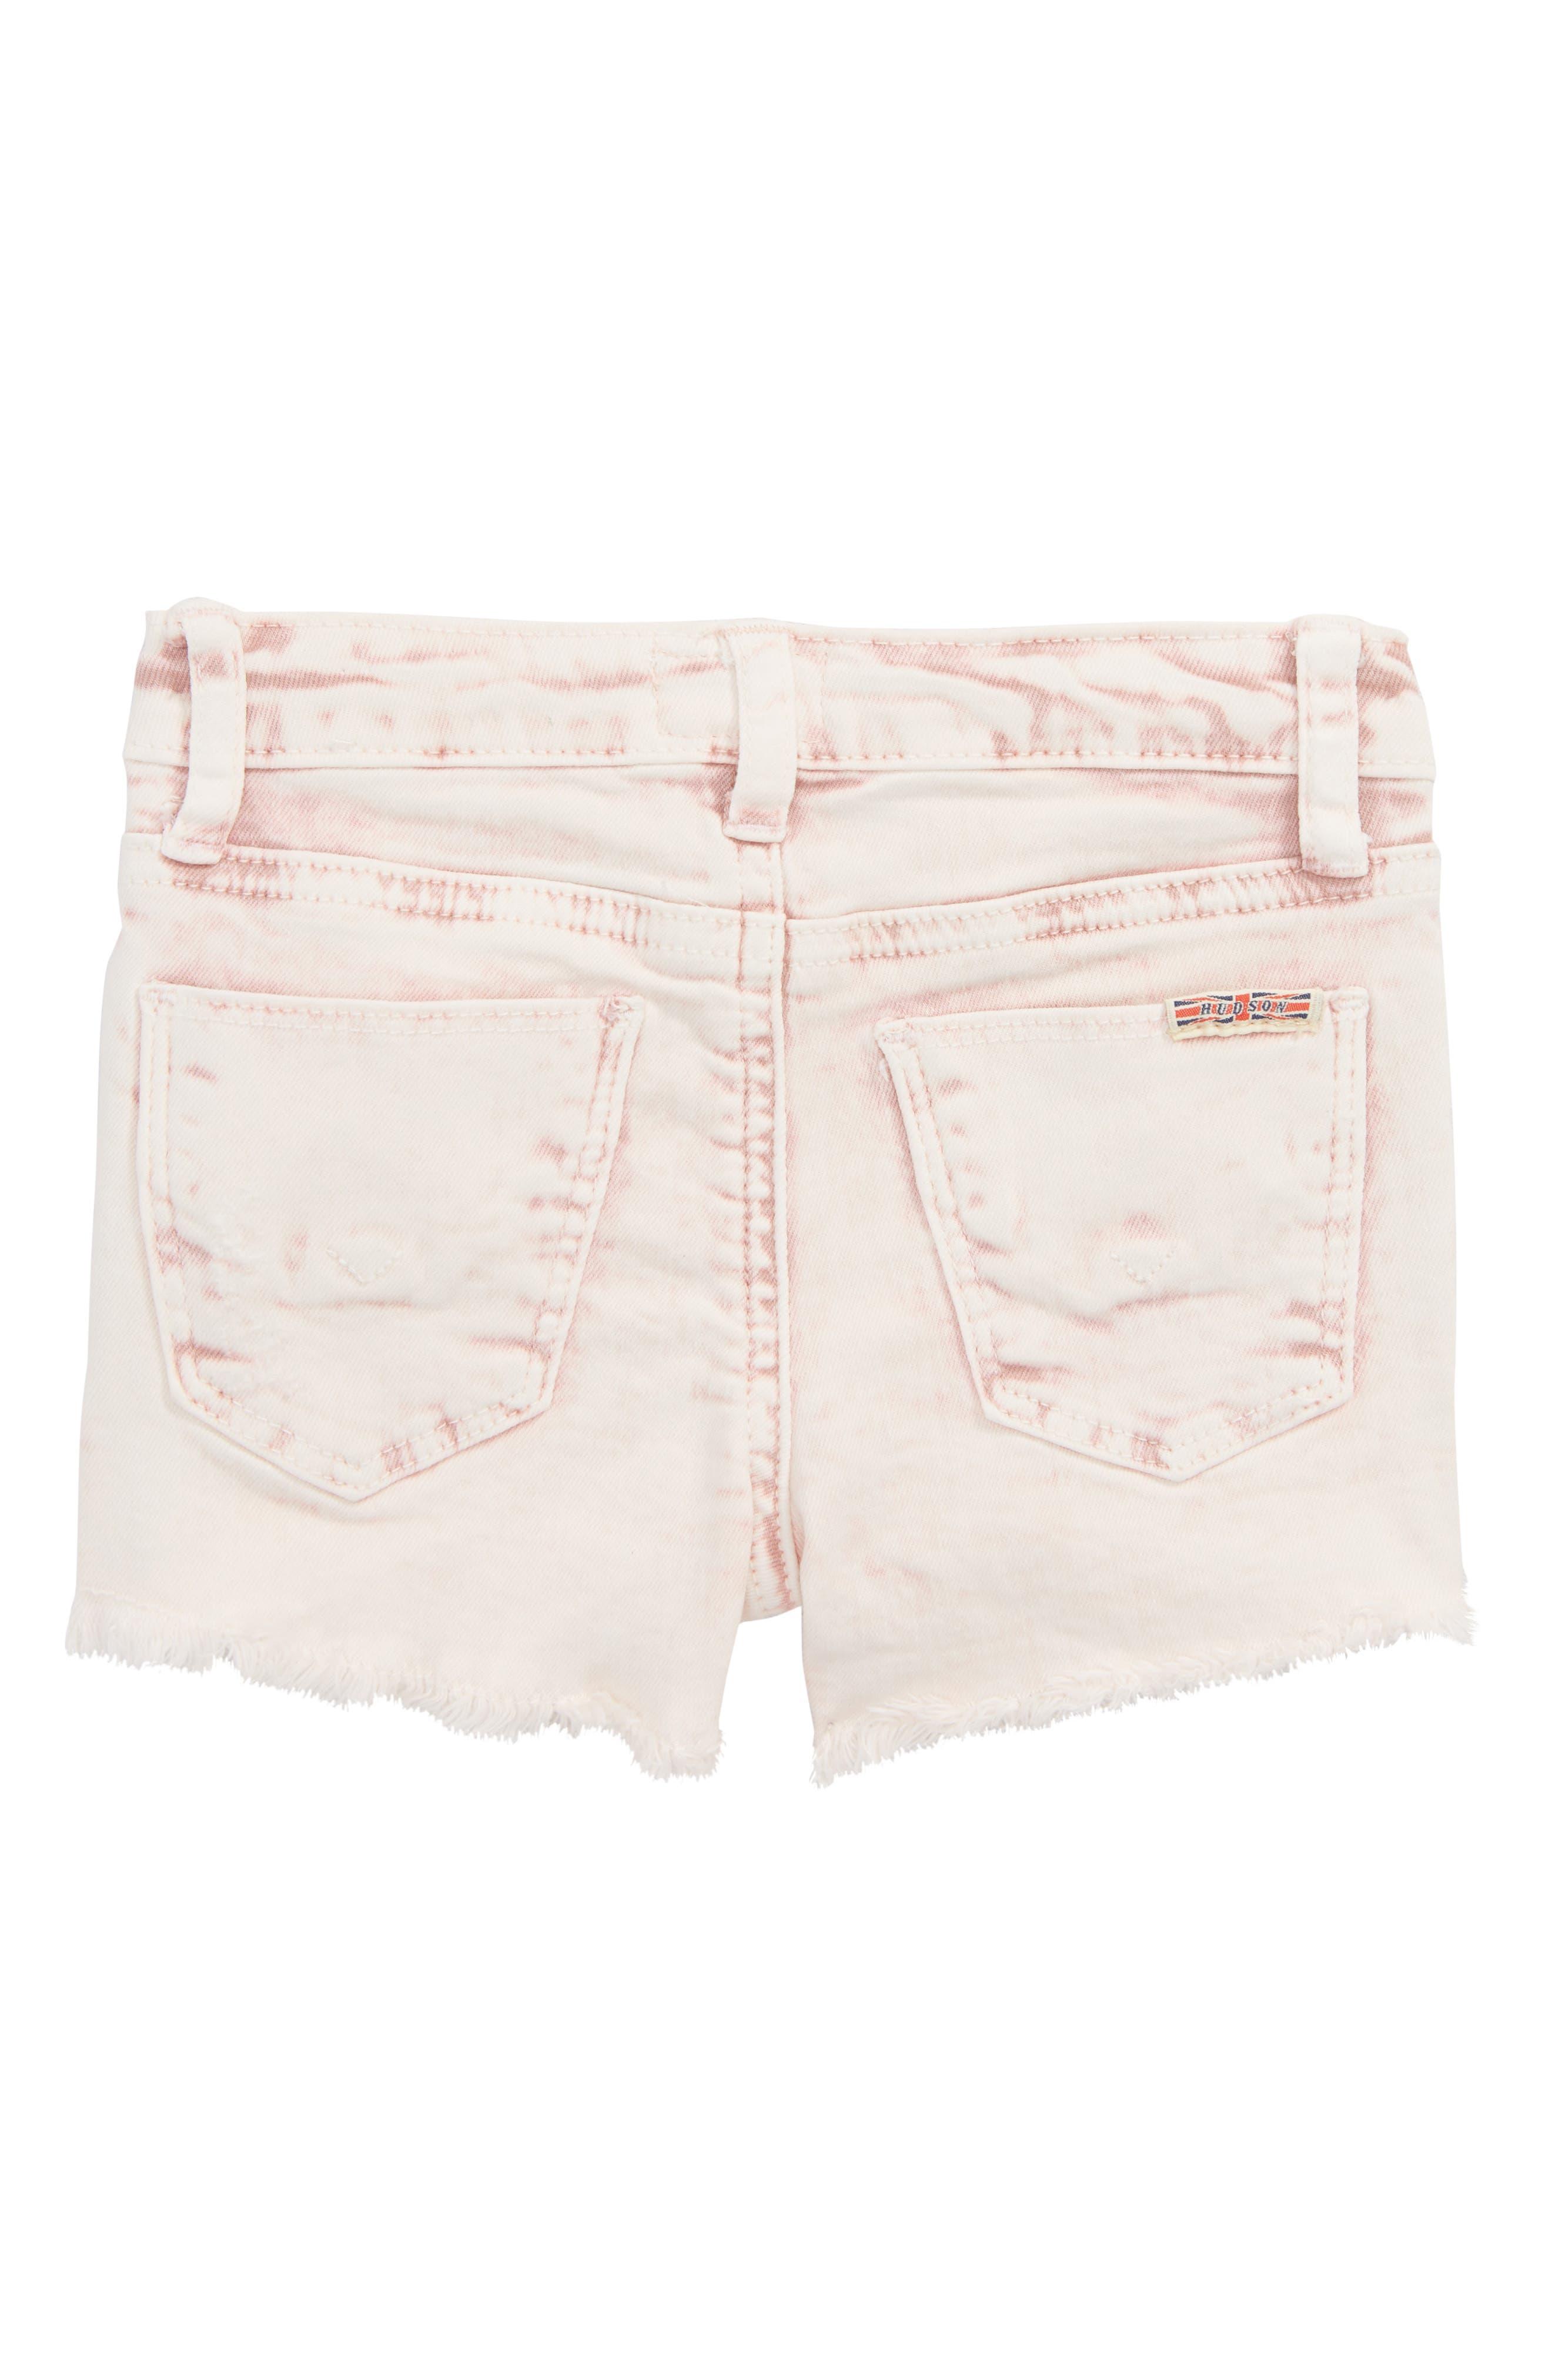 Frayed Acid Wash Shorts,                             Alternate thumbnail 2, color,                             691